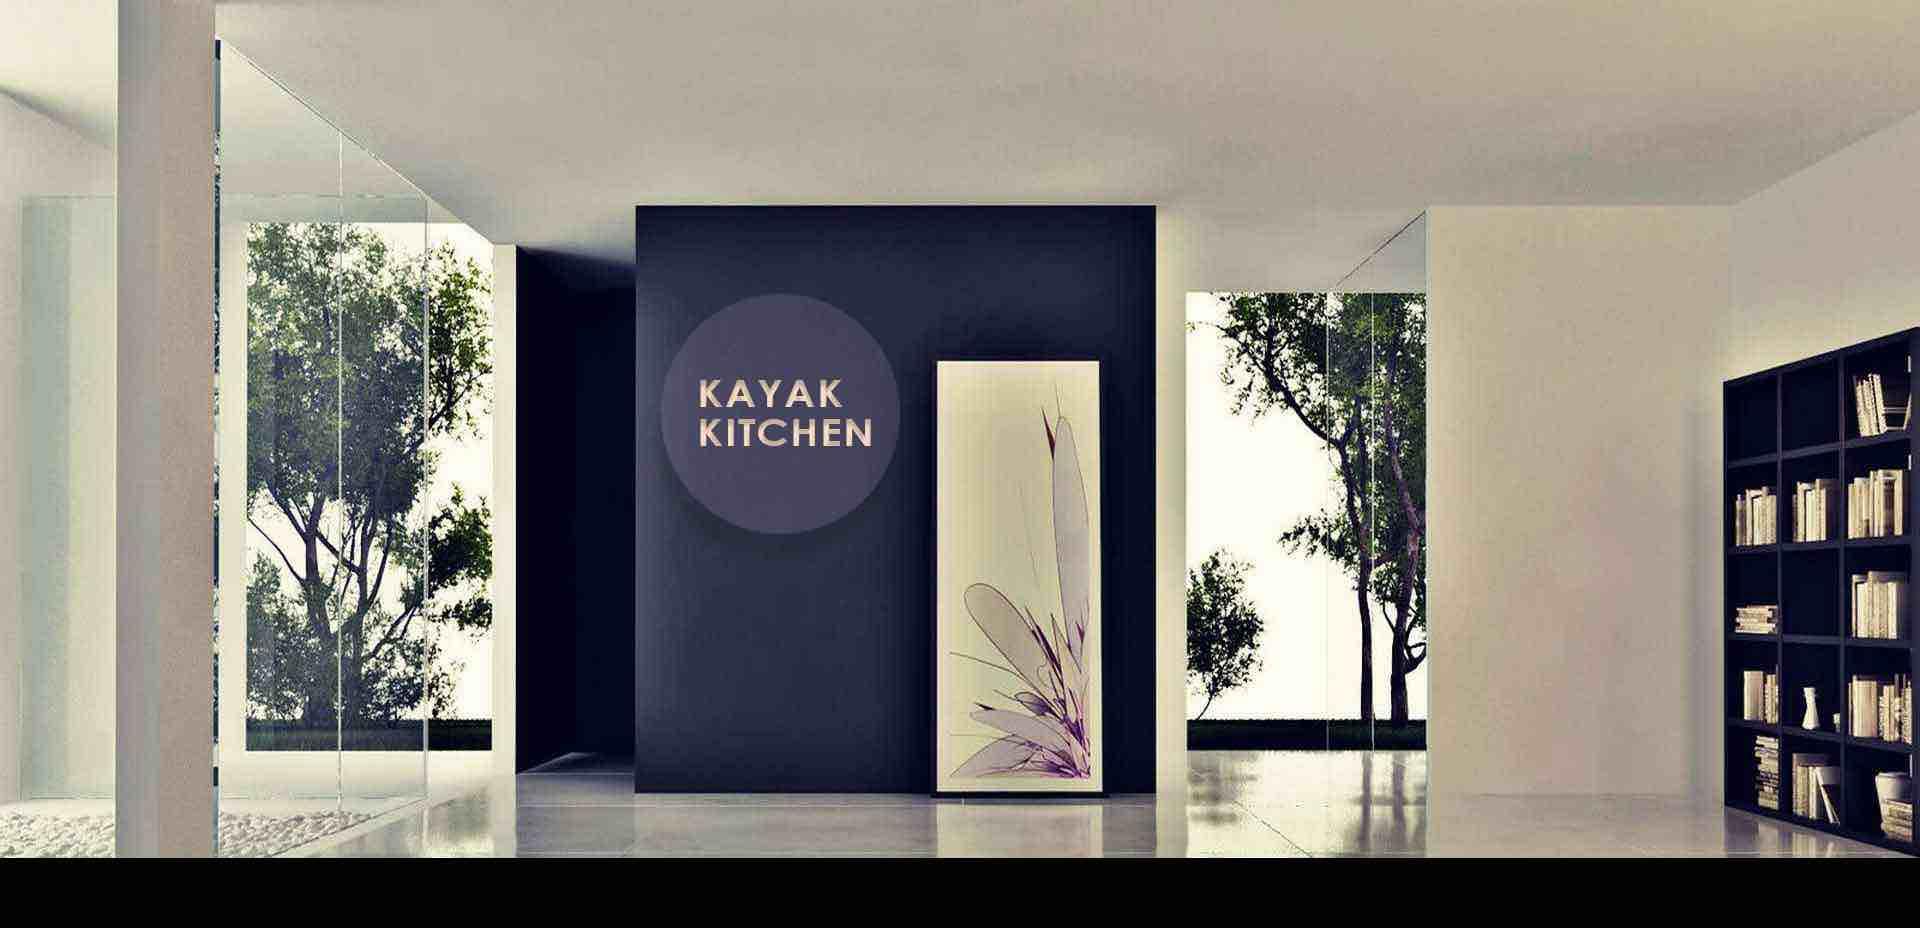 Kayak Kitchen